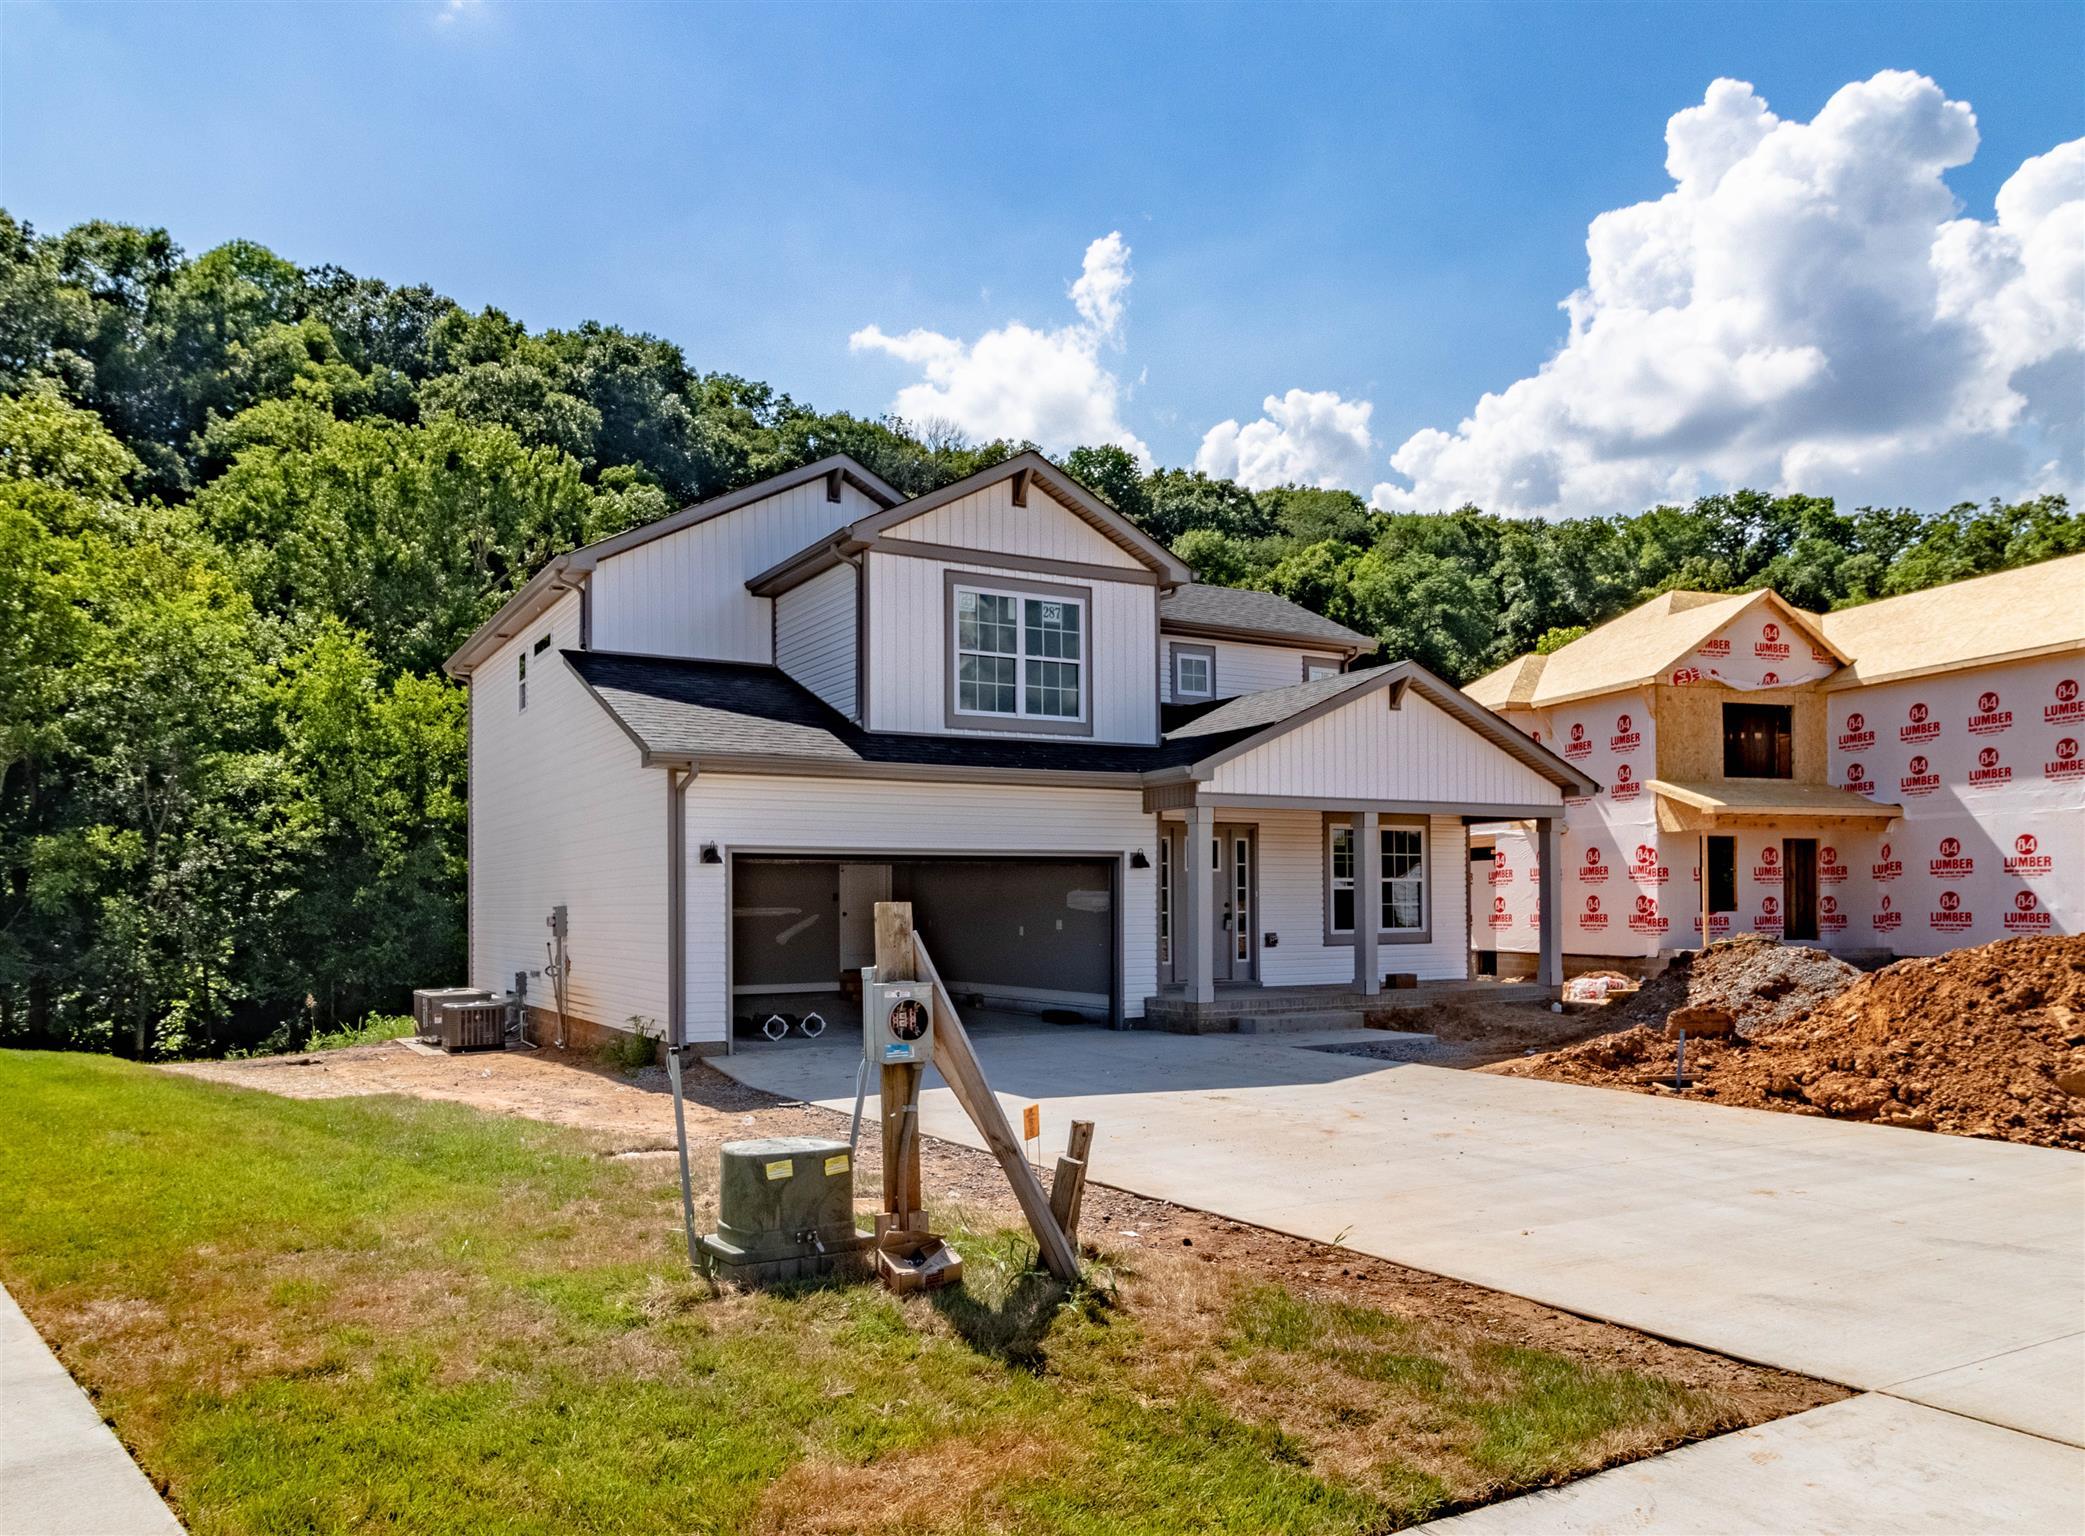 1653 Rains Rd, Clarksville, TN 37042 - Clarksville, TN real estate listing